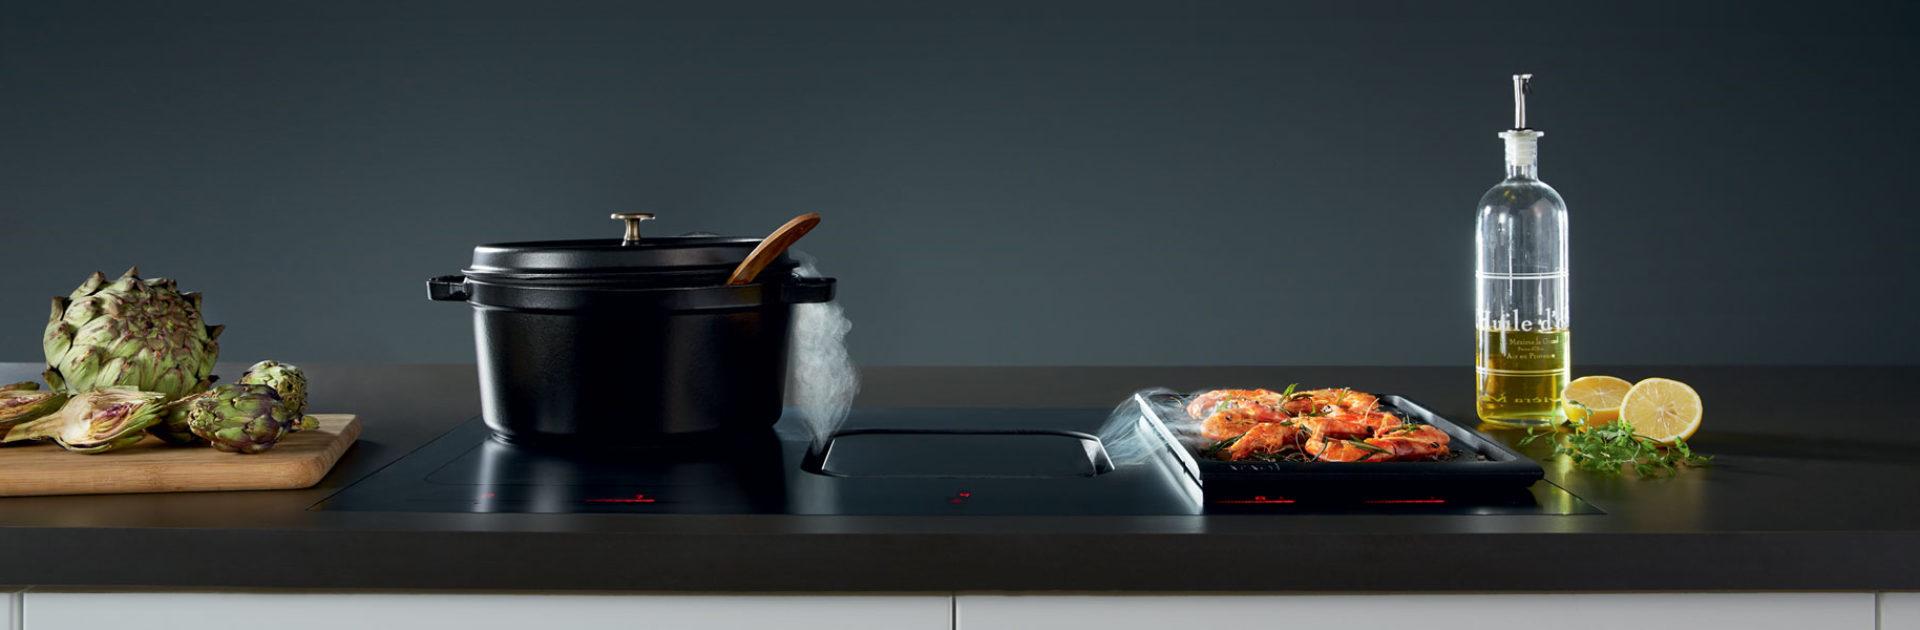 Keuken inspiratie | Satink Keukens